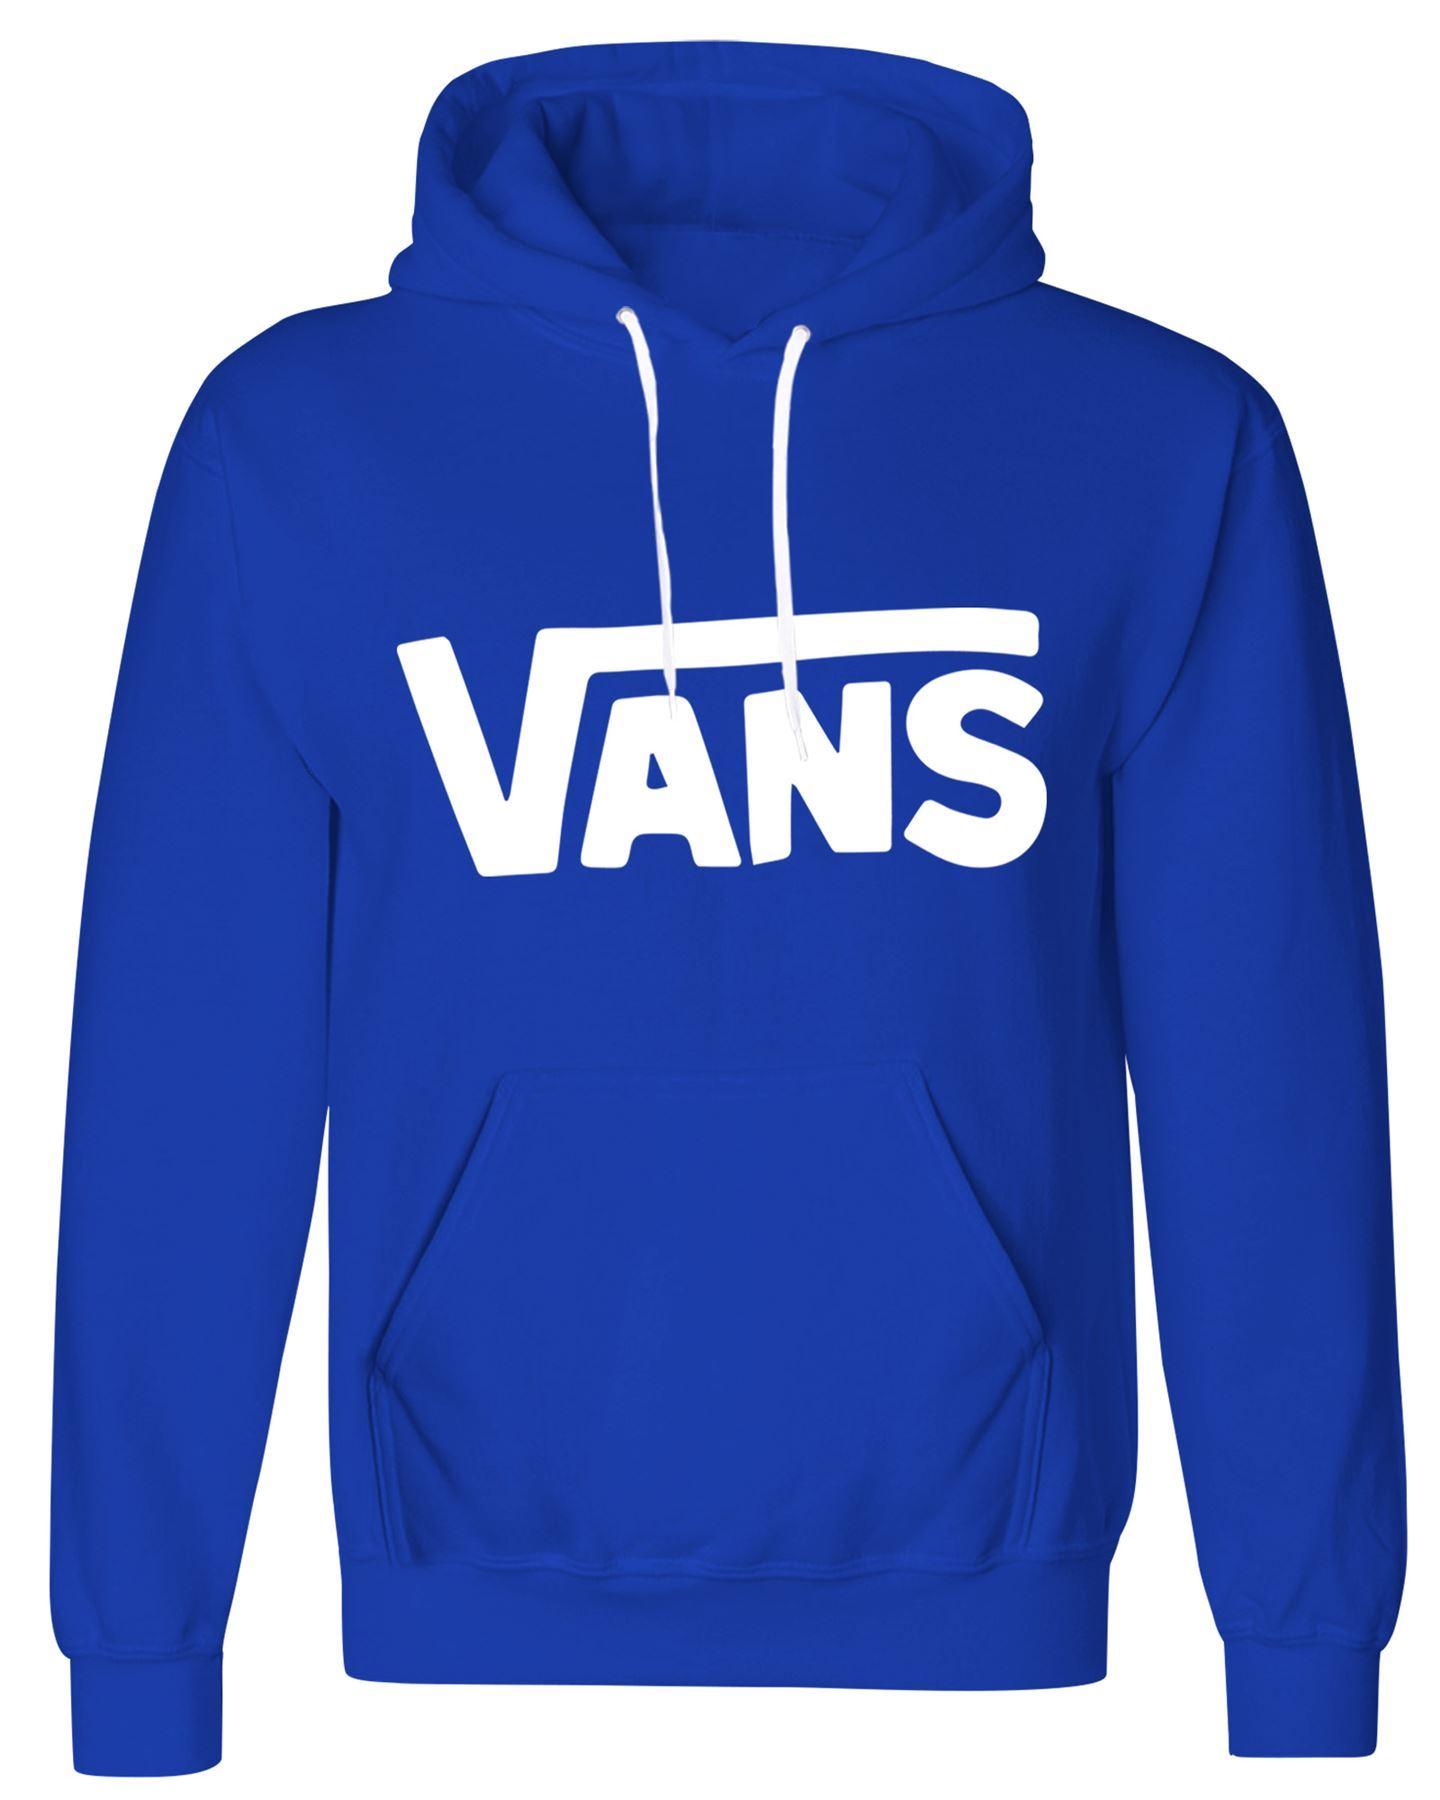 Classic Vans Logo Printed Sweatshirt Mens Womens Vans